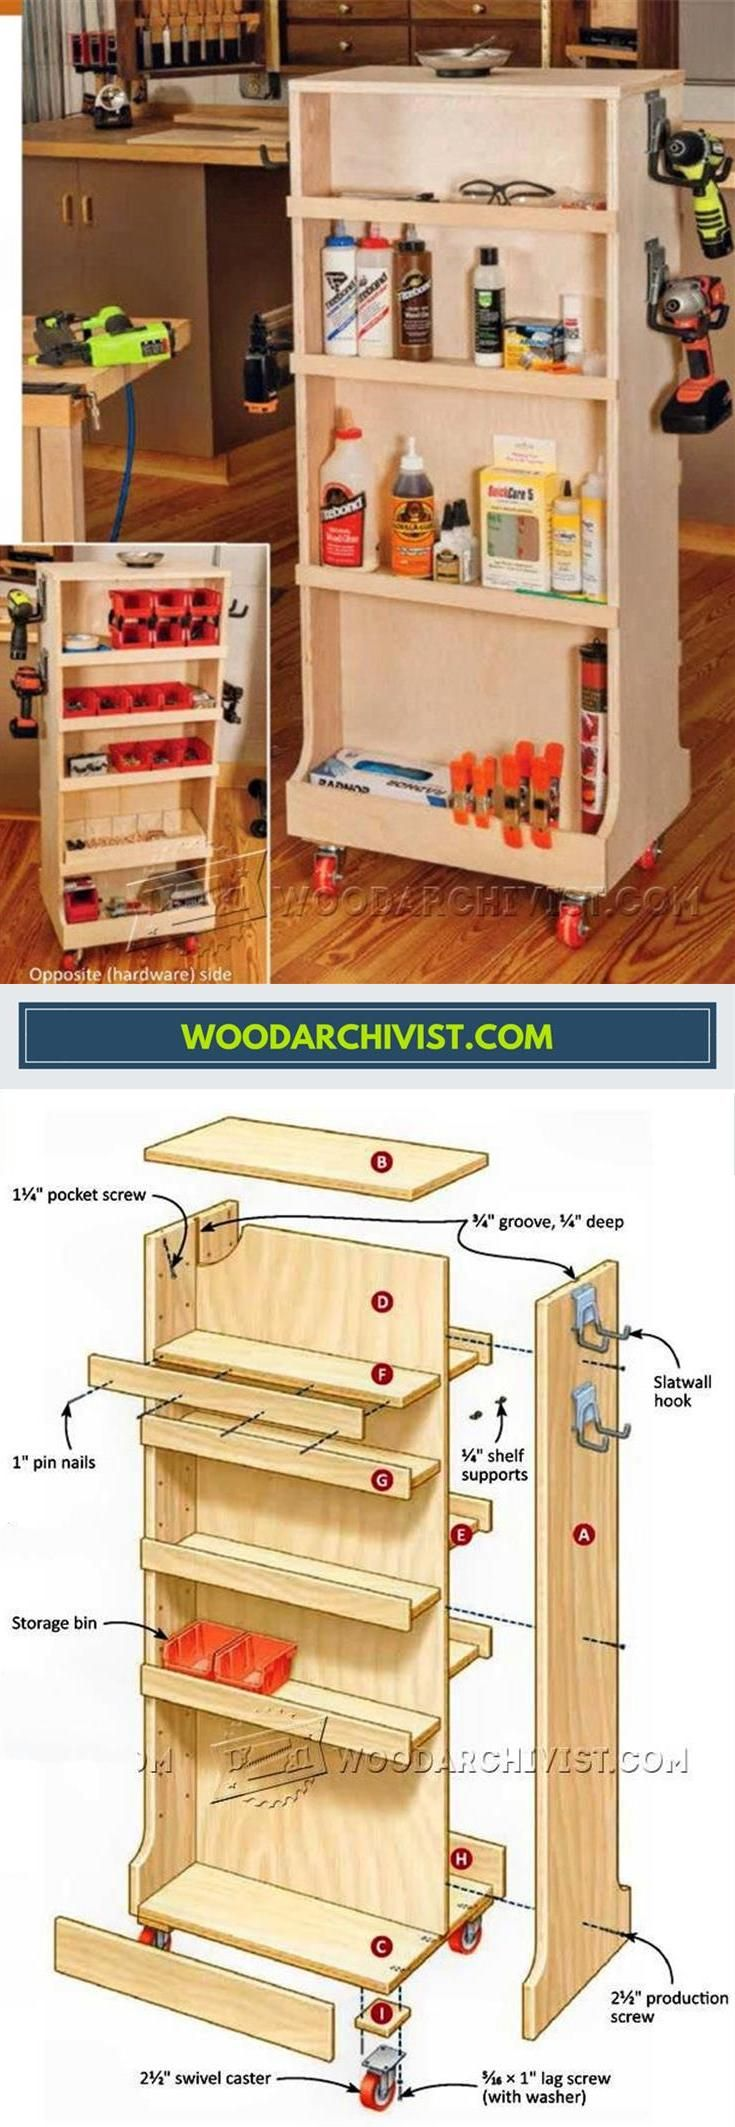 Mobile Shop Cart Plans - Workshop Solutions Projects, Tips and Tricks | WoodArchivist.com